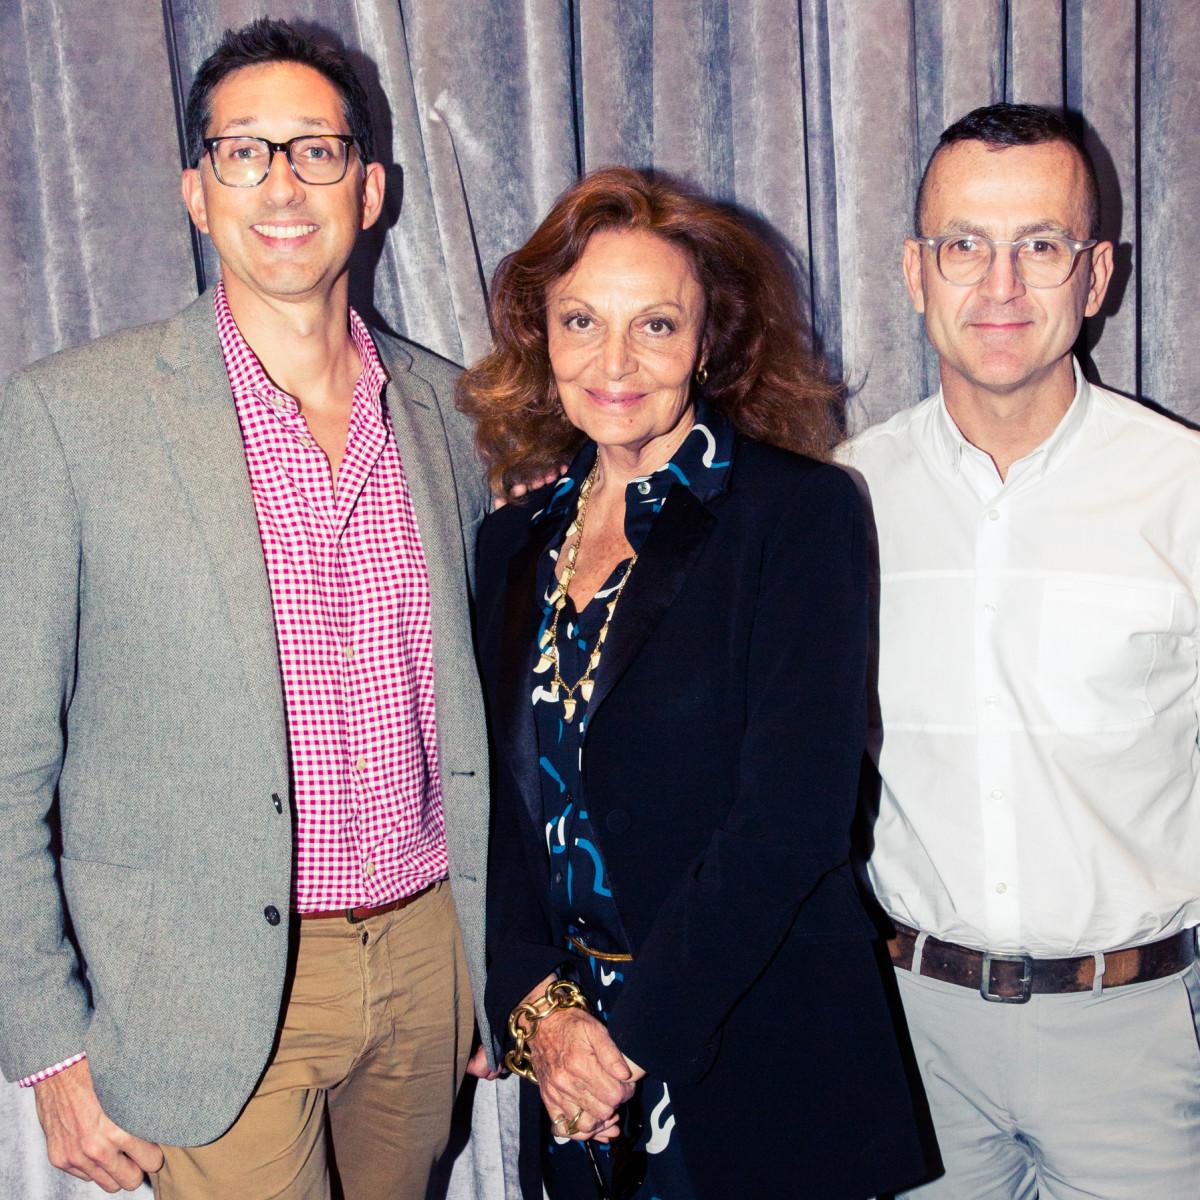 Anthony Ingham, W Hotels Global Brand Leader, with Diane von Furstenberg and Steven Kolb. Photo: W Hotels